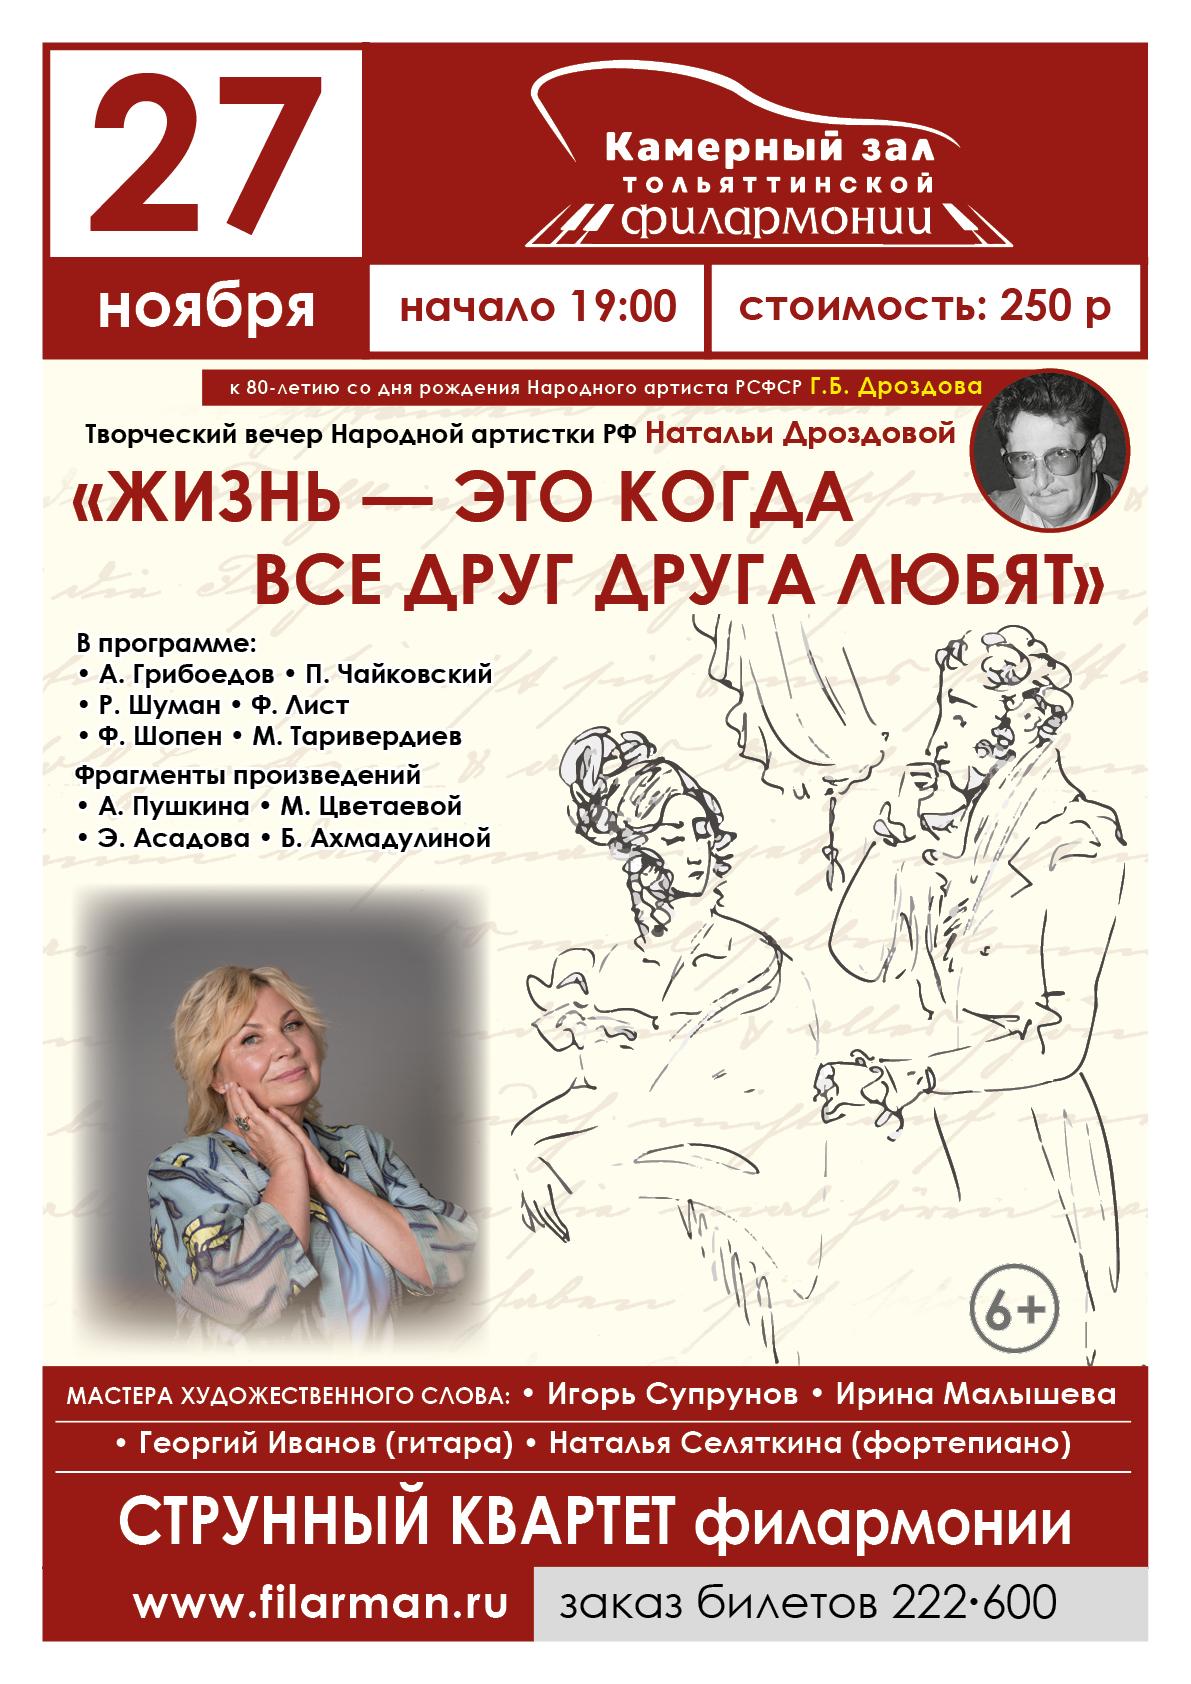 Творческий вечер Натальи Дроздовой